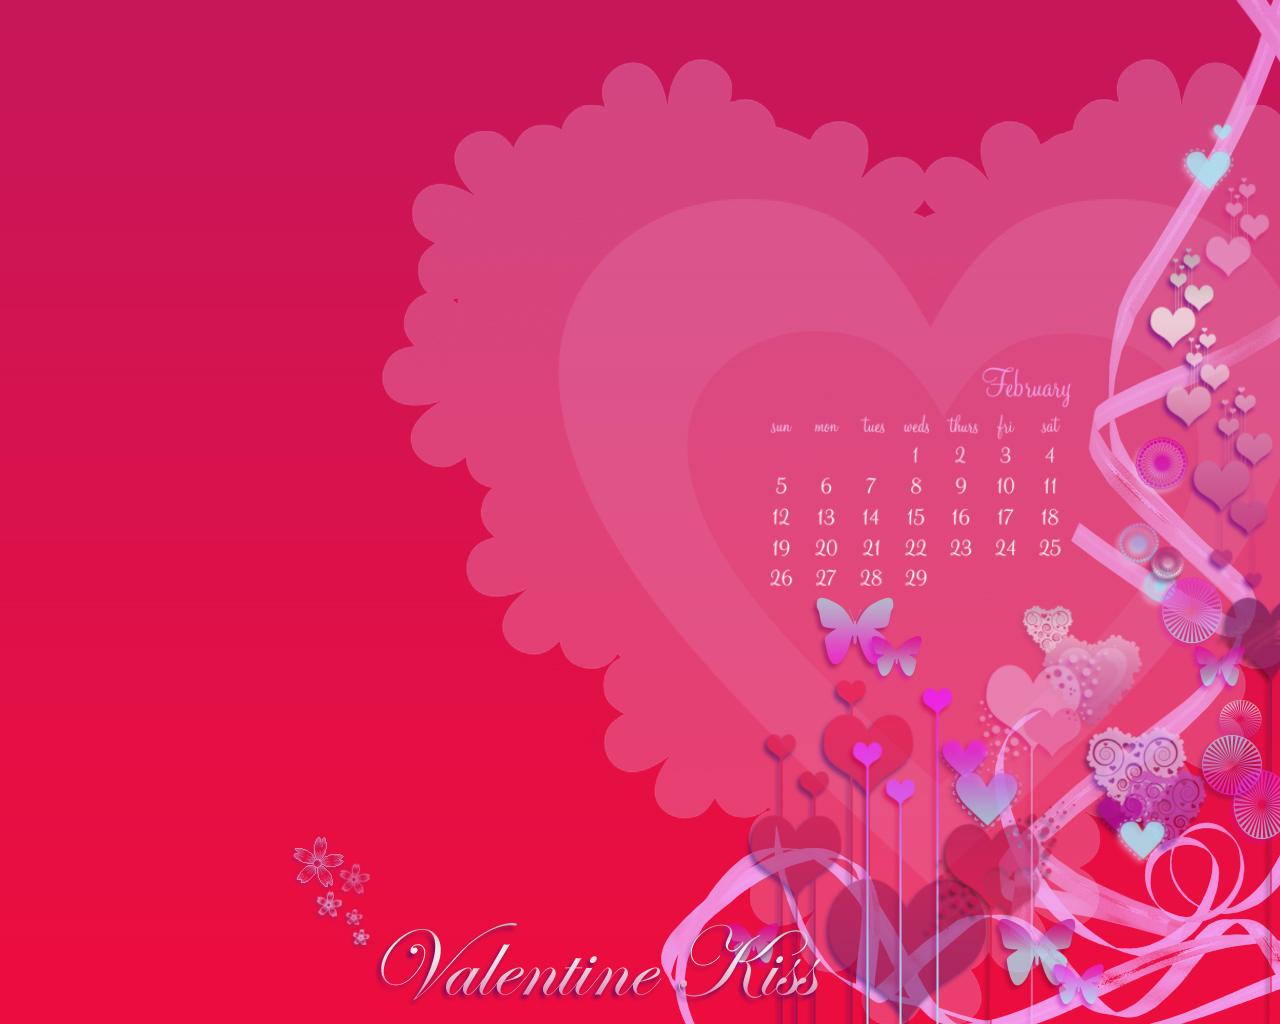 February Desktop Valentine 1280 x1024